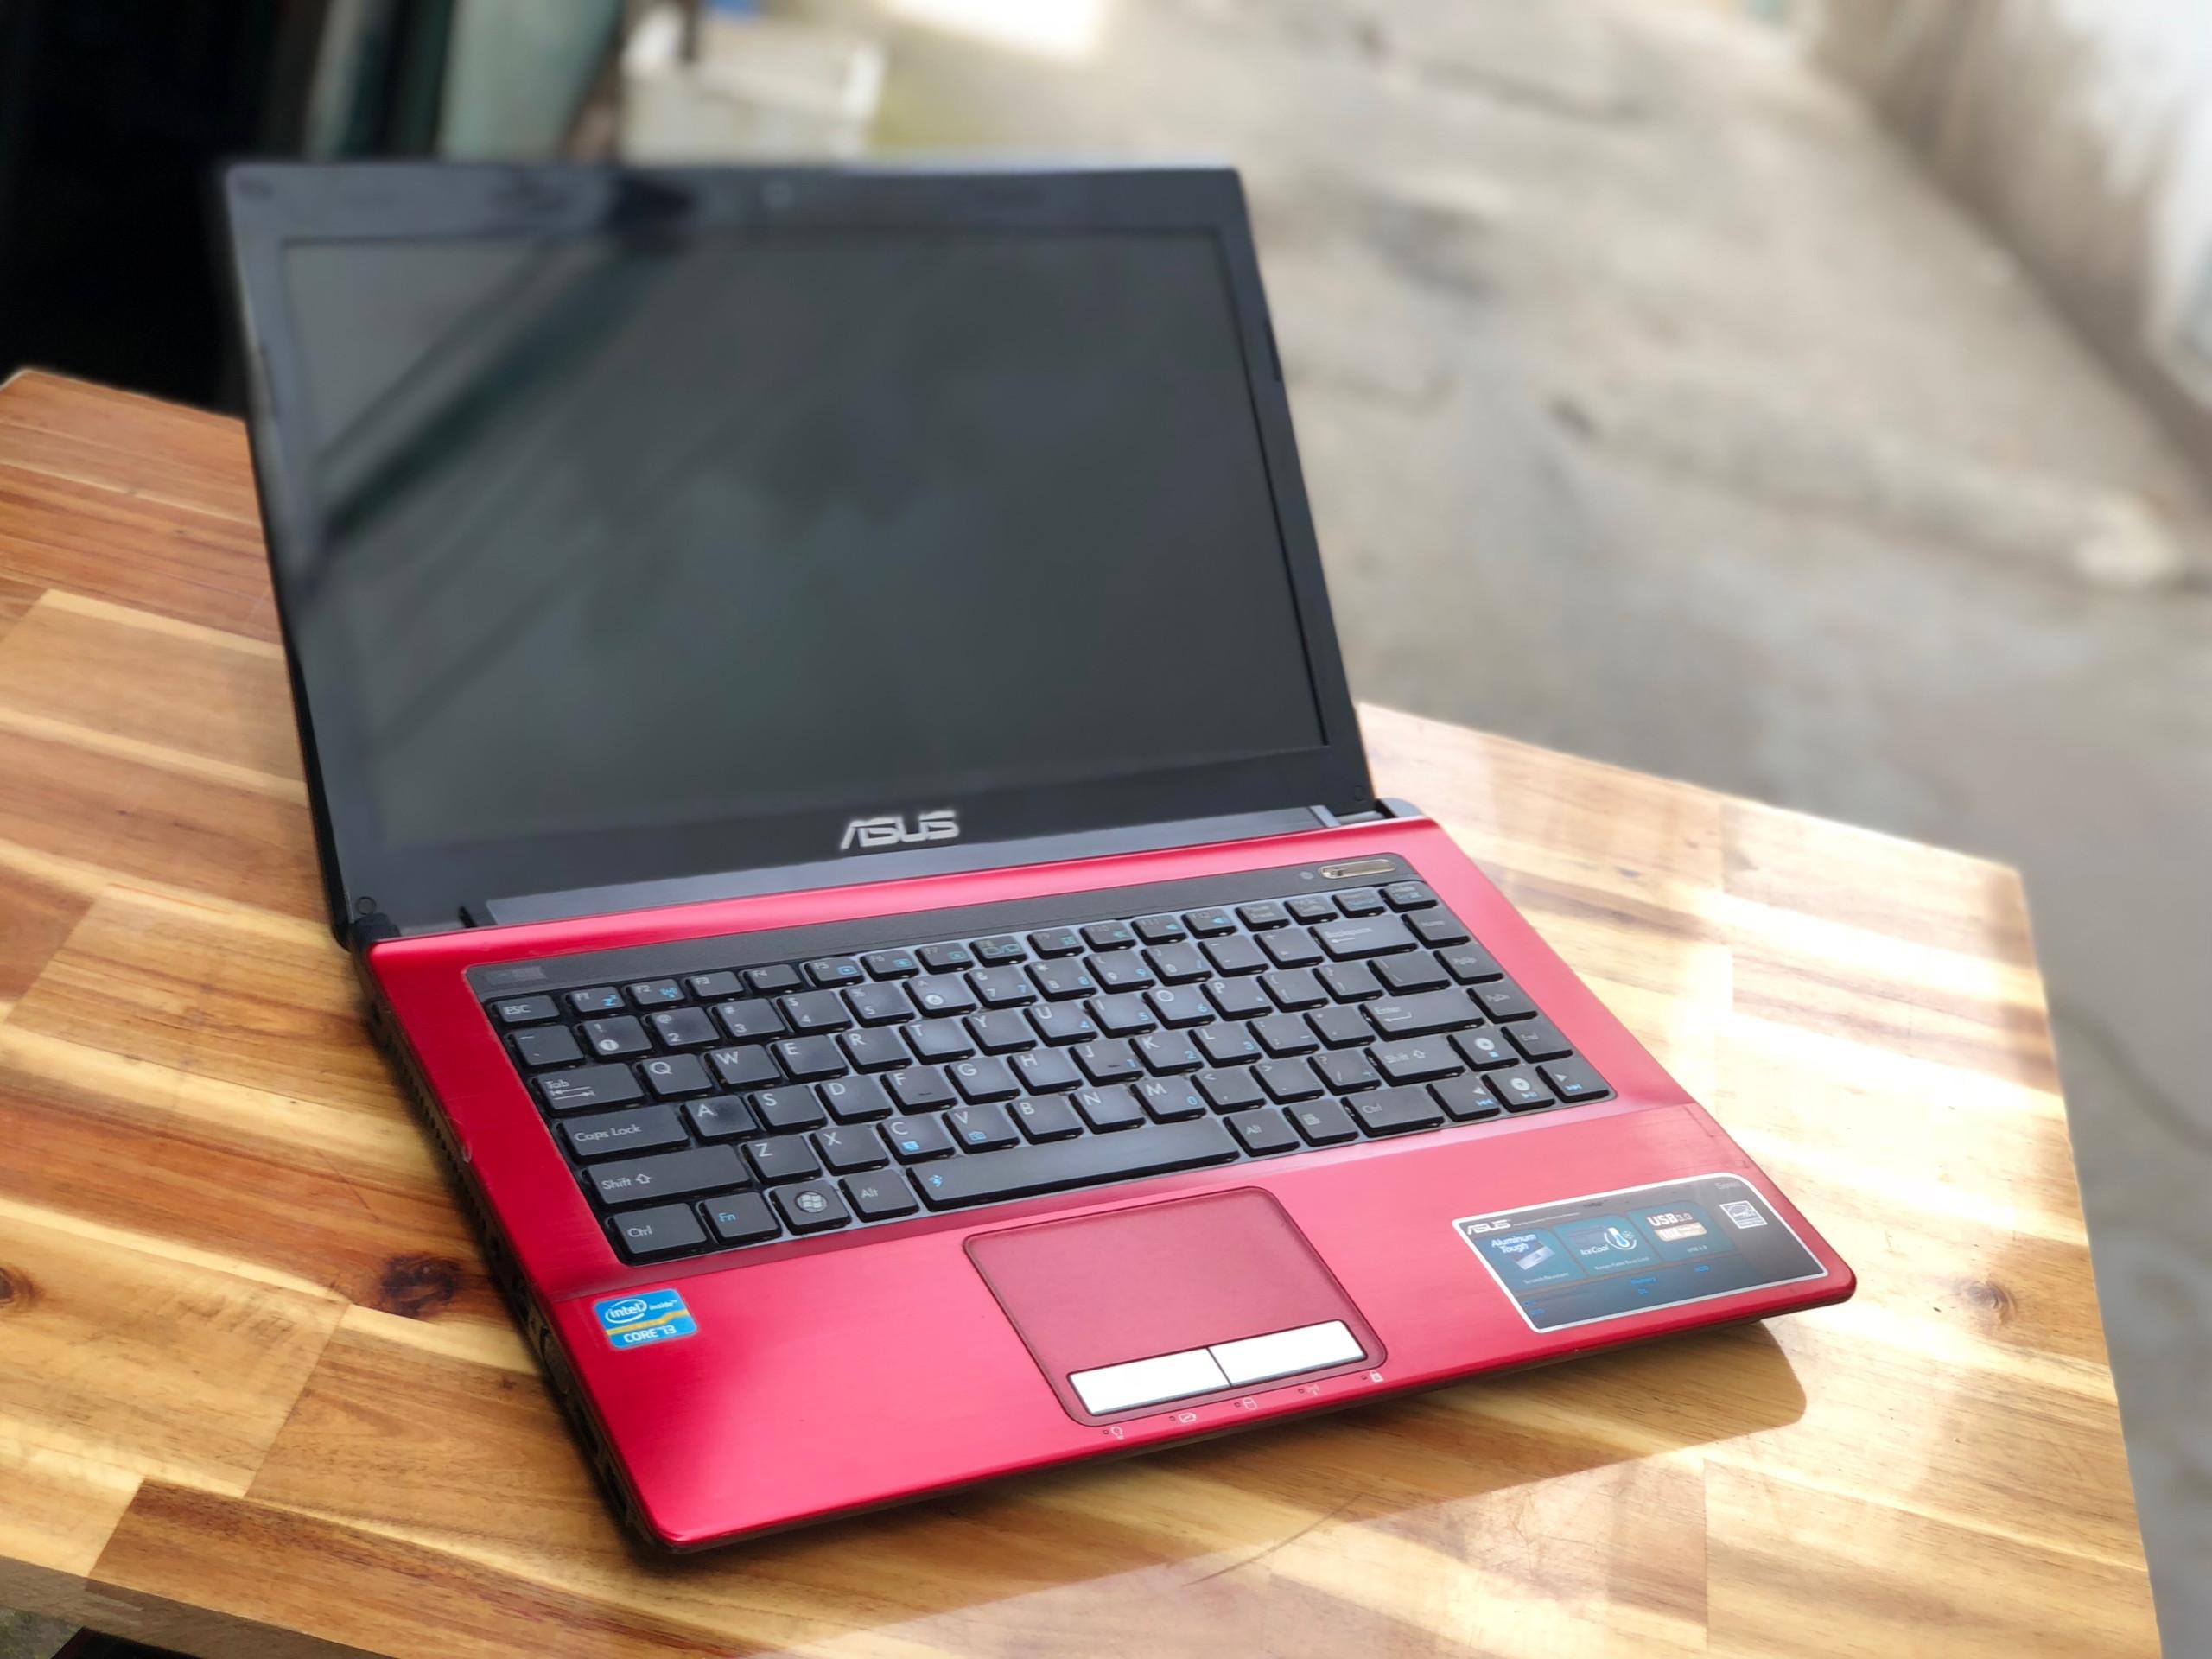 laptop-asus-van-phong-hoc-tap-gia-re-2